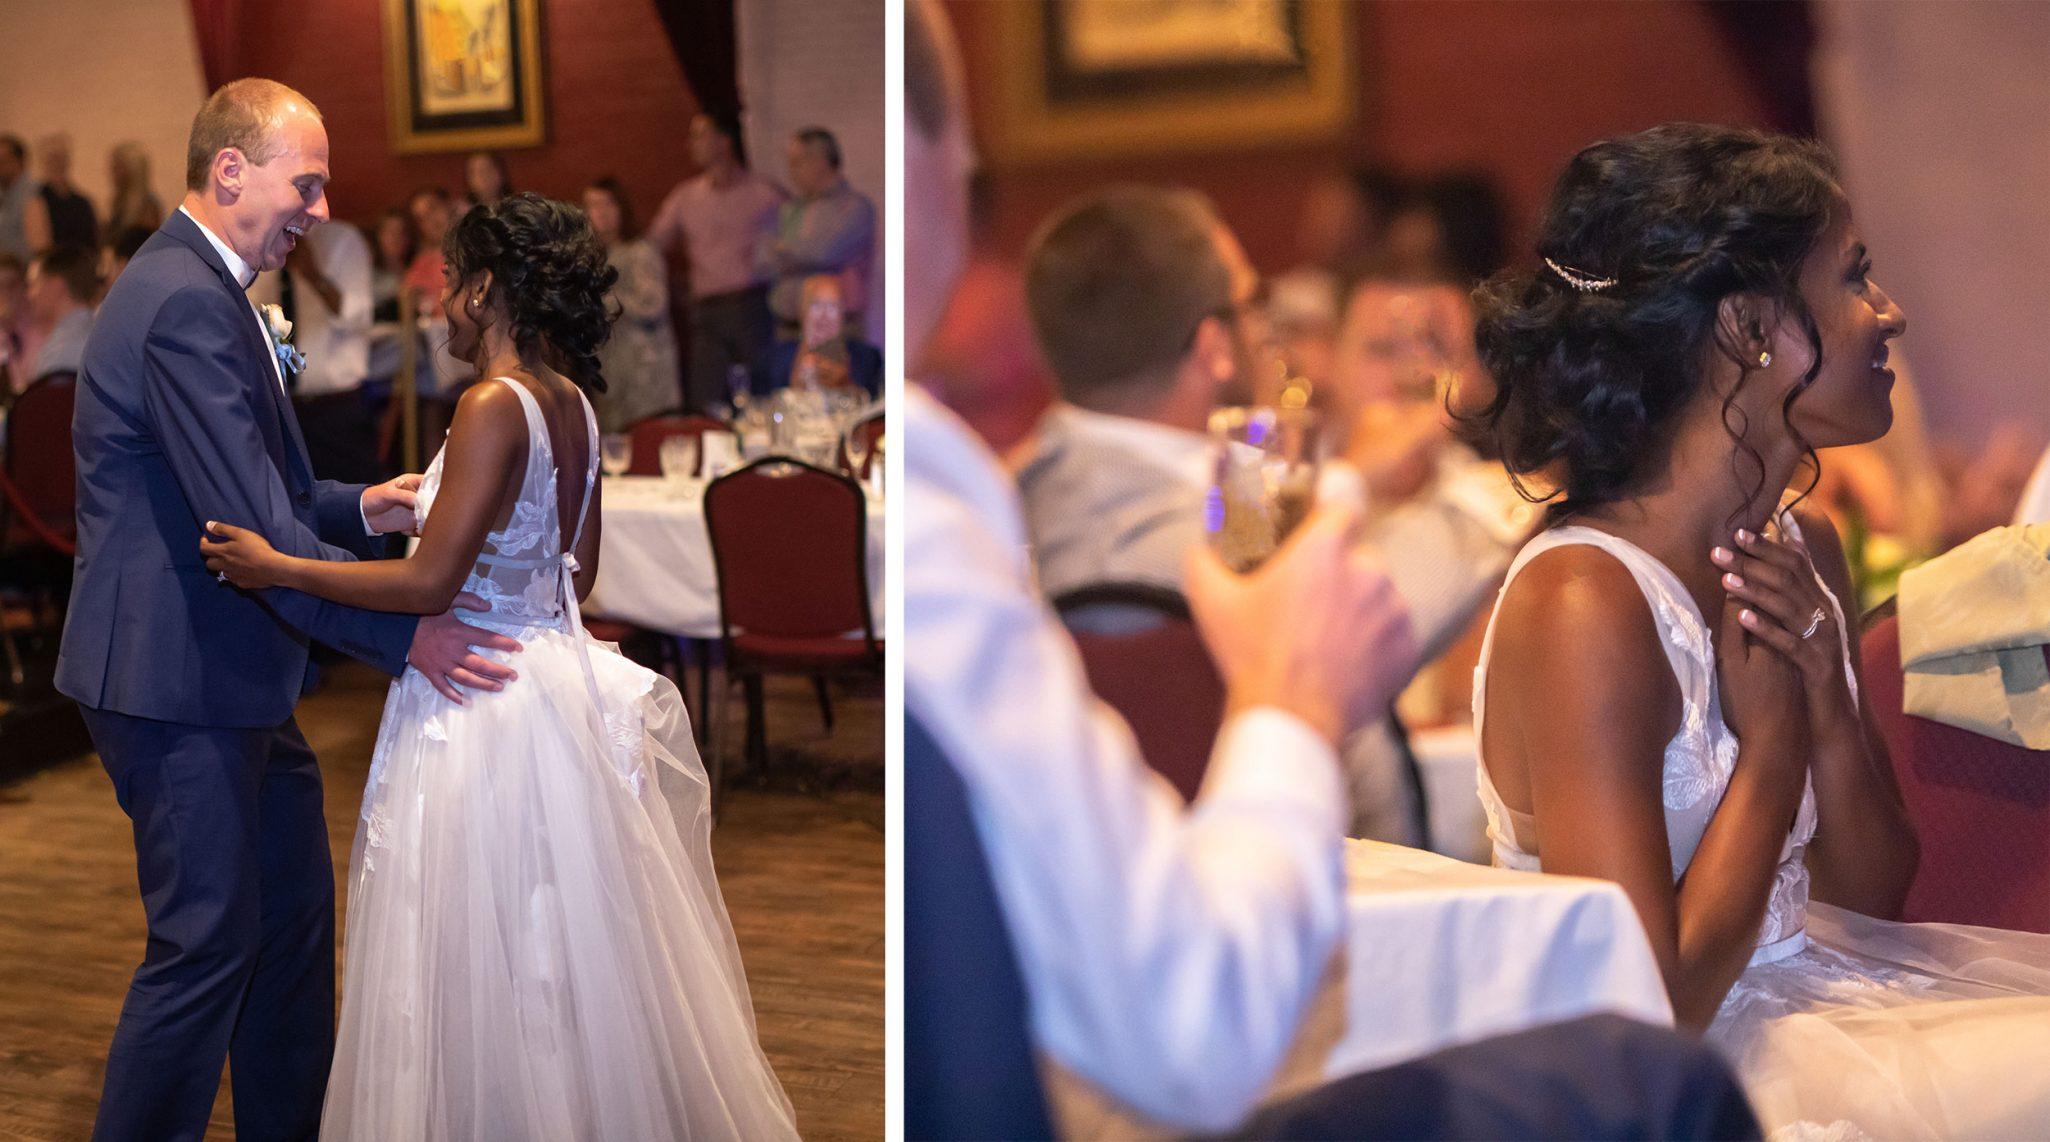 Wedding reception at The Strater Hotel, Durango, Colorado